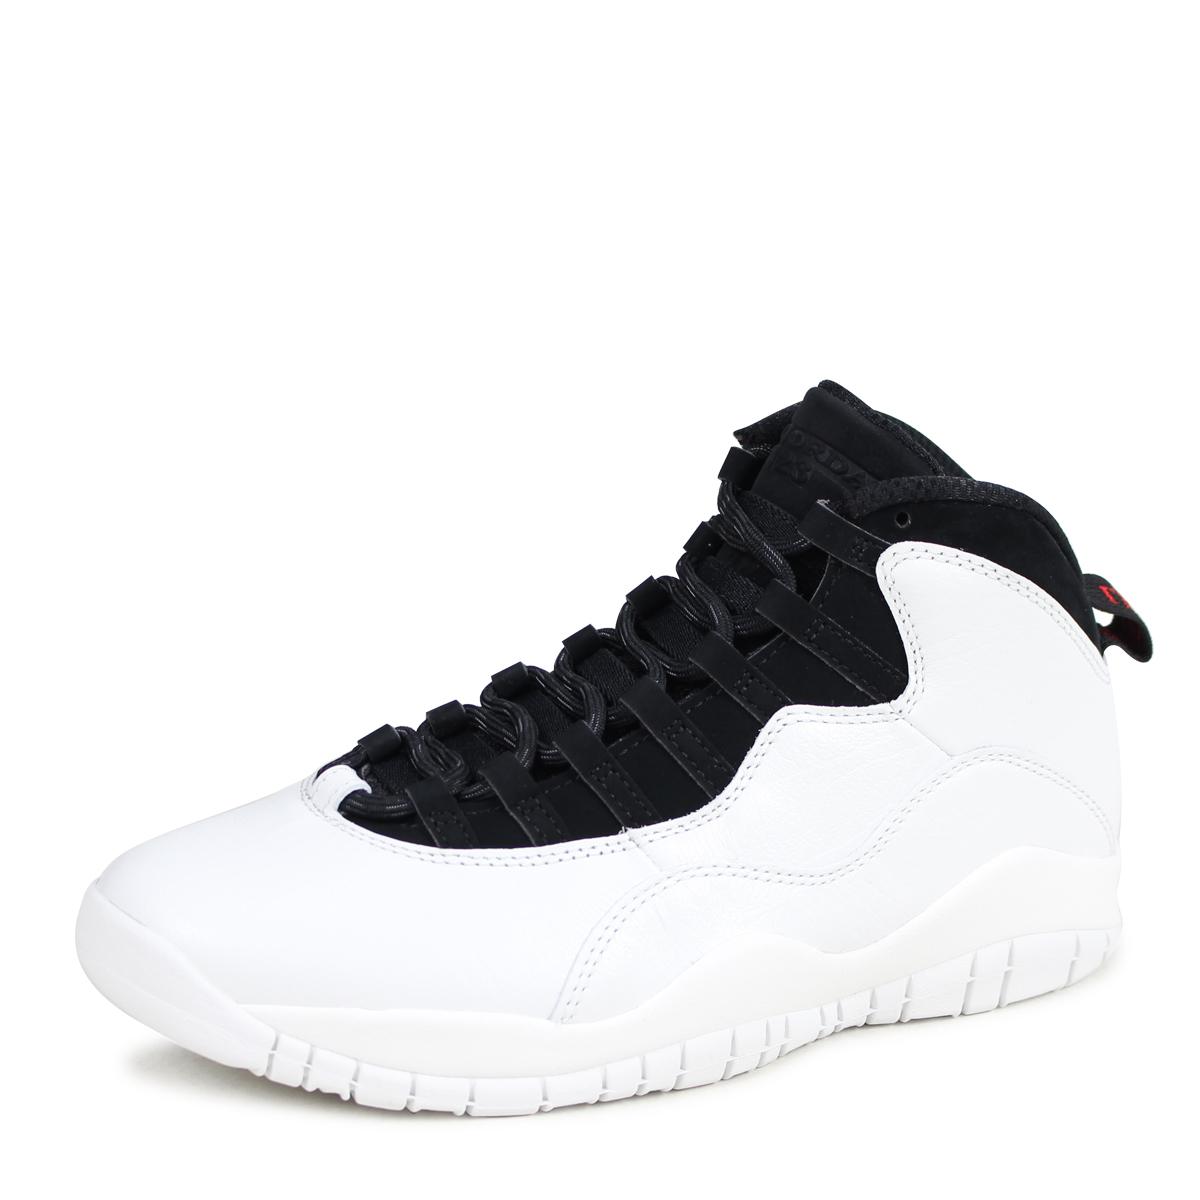 on sale 34884 d34b7 NIKE AIR JORDAN 10 RETRO I M BACK Nike Air Jordan 10 nostalgic sneakers men  310,805-104 white  3 30 Shinnyu load   183